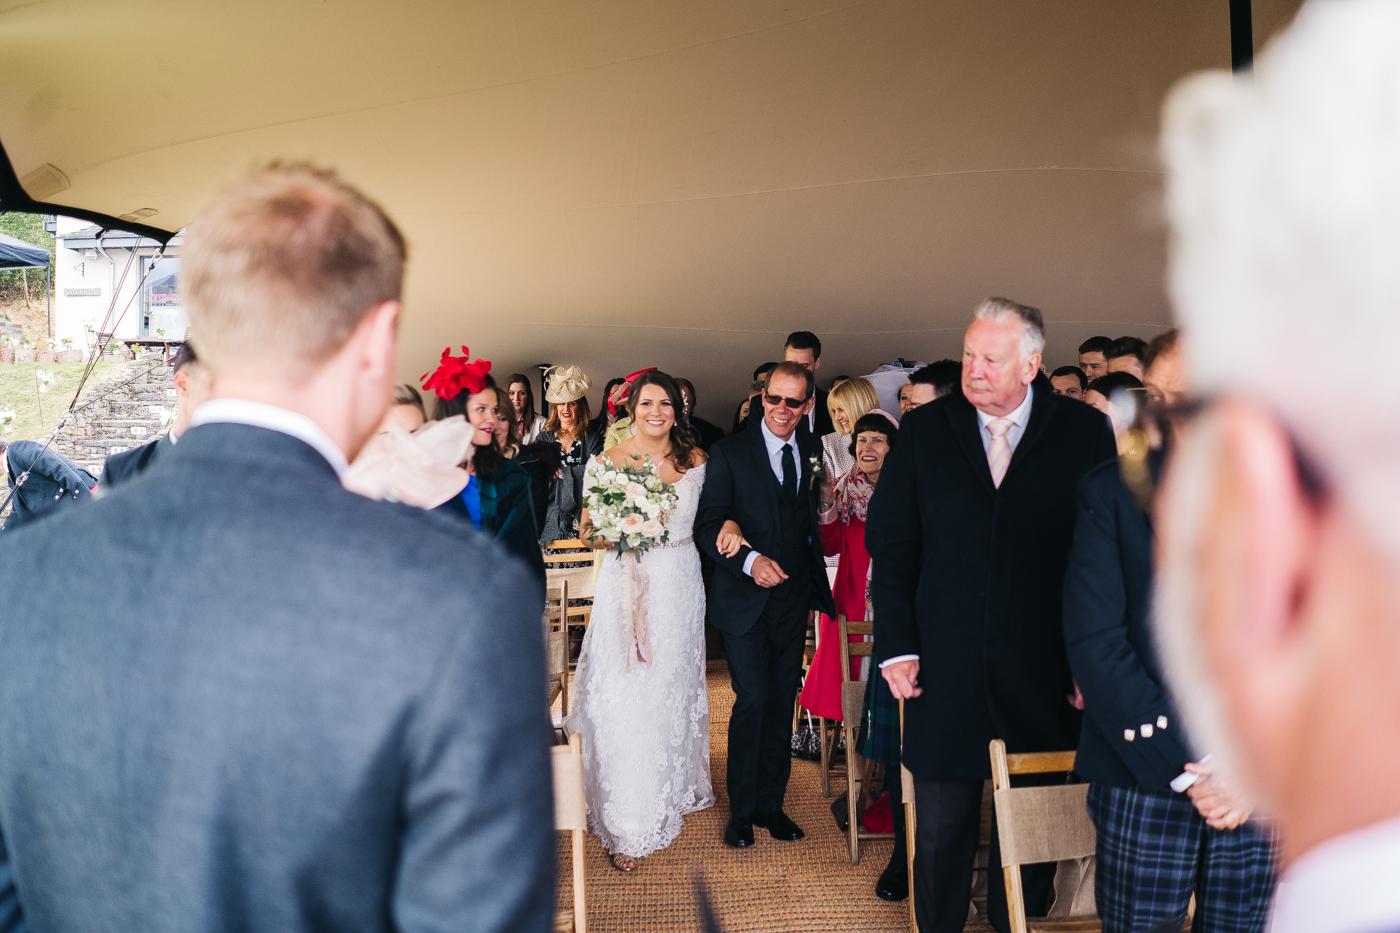 scottish-wedding-trossachs-loch-tay-highlannds-relaxed-photography-photographer-0016.jpg